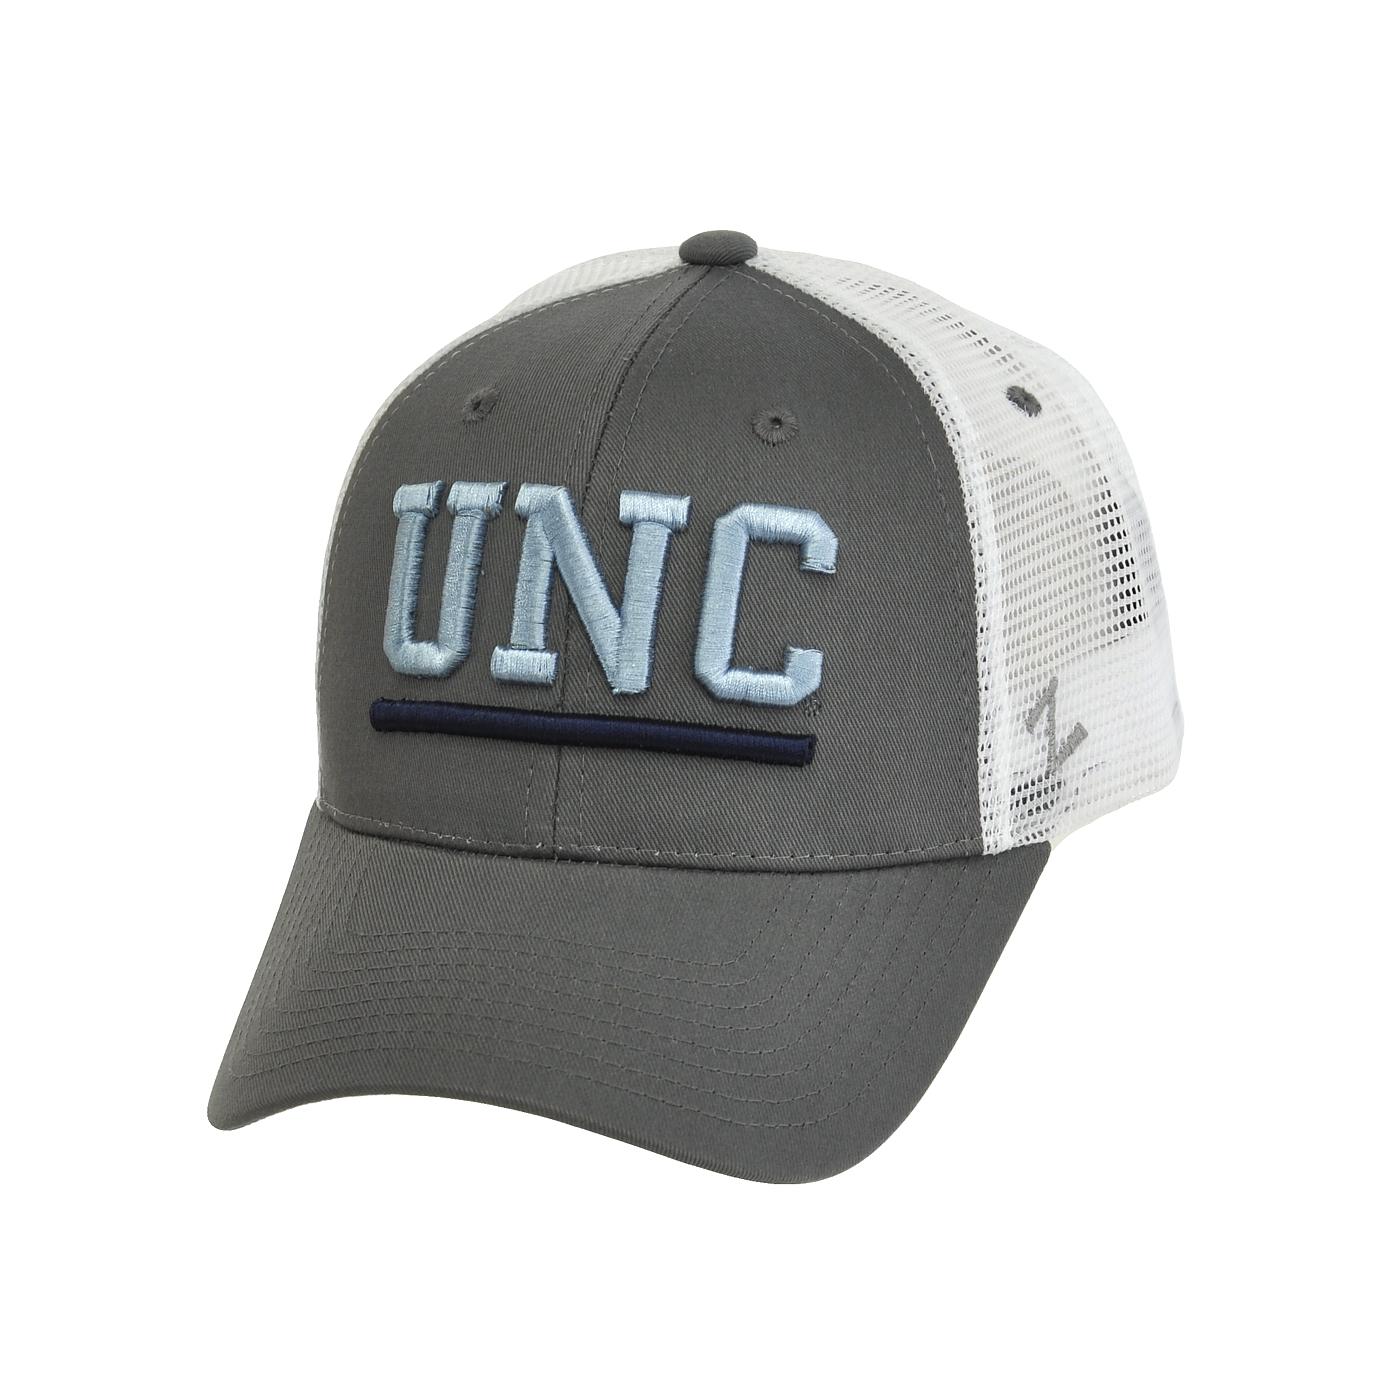 timeless design 9a9bd c5756 Johnny T-shirt - North Carolina Tar Heels - UNC Trucker Hat (Grey White) by  Zephyr